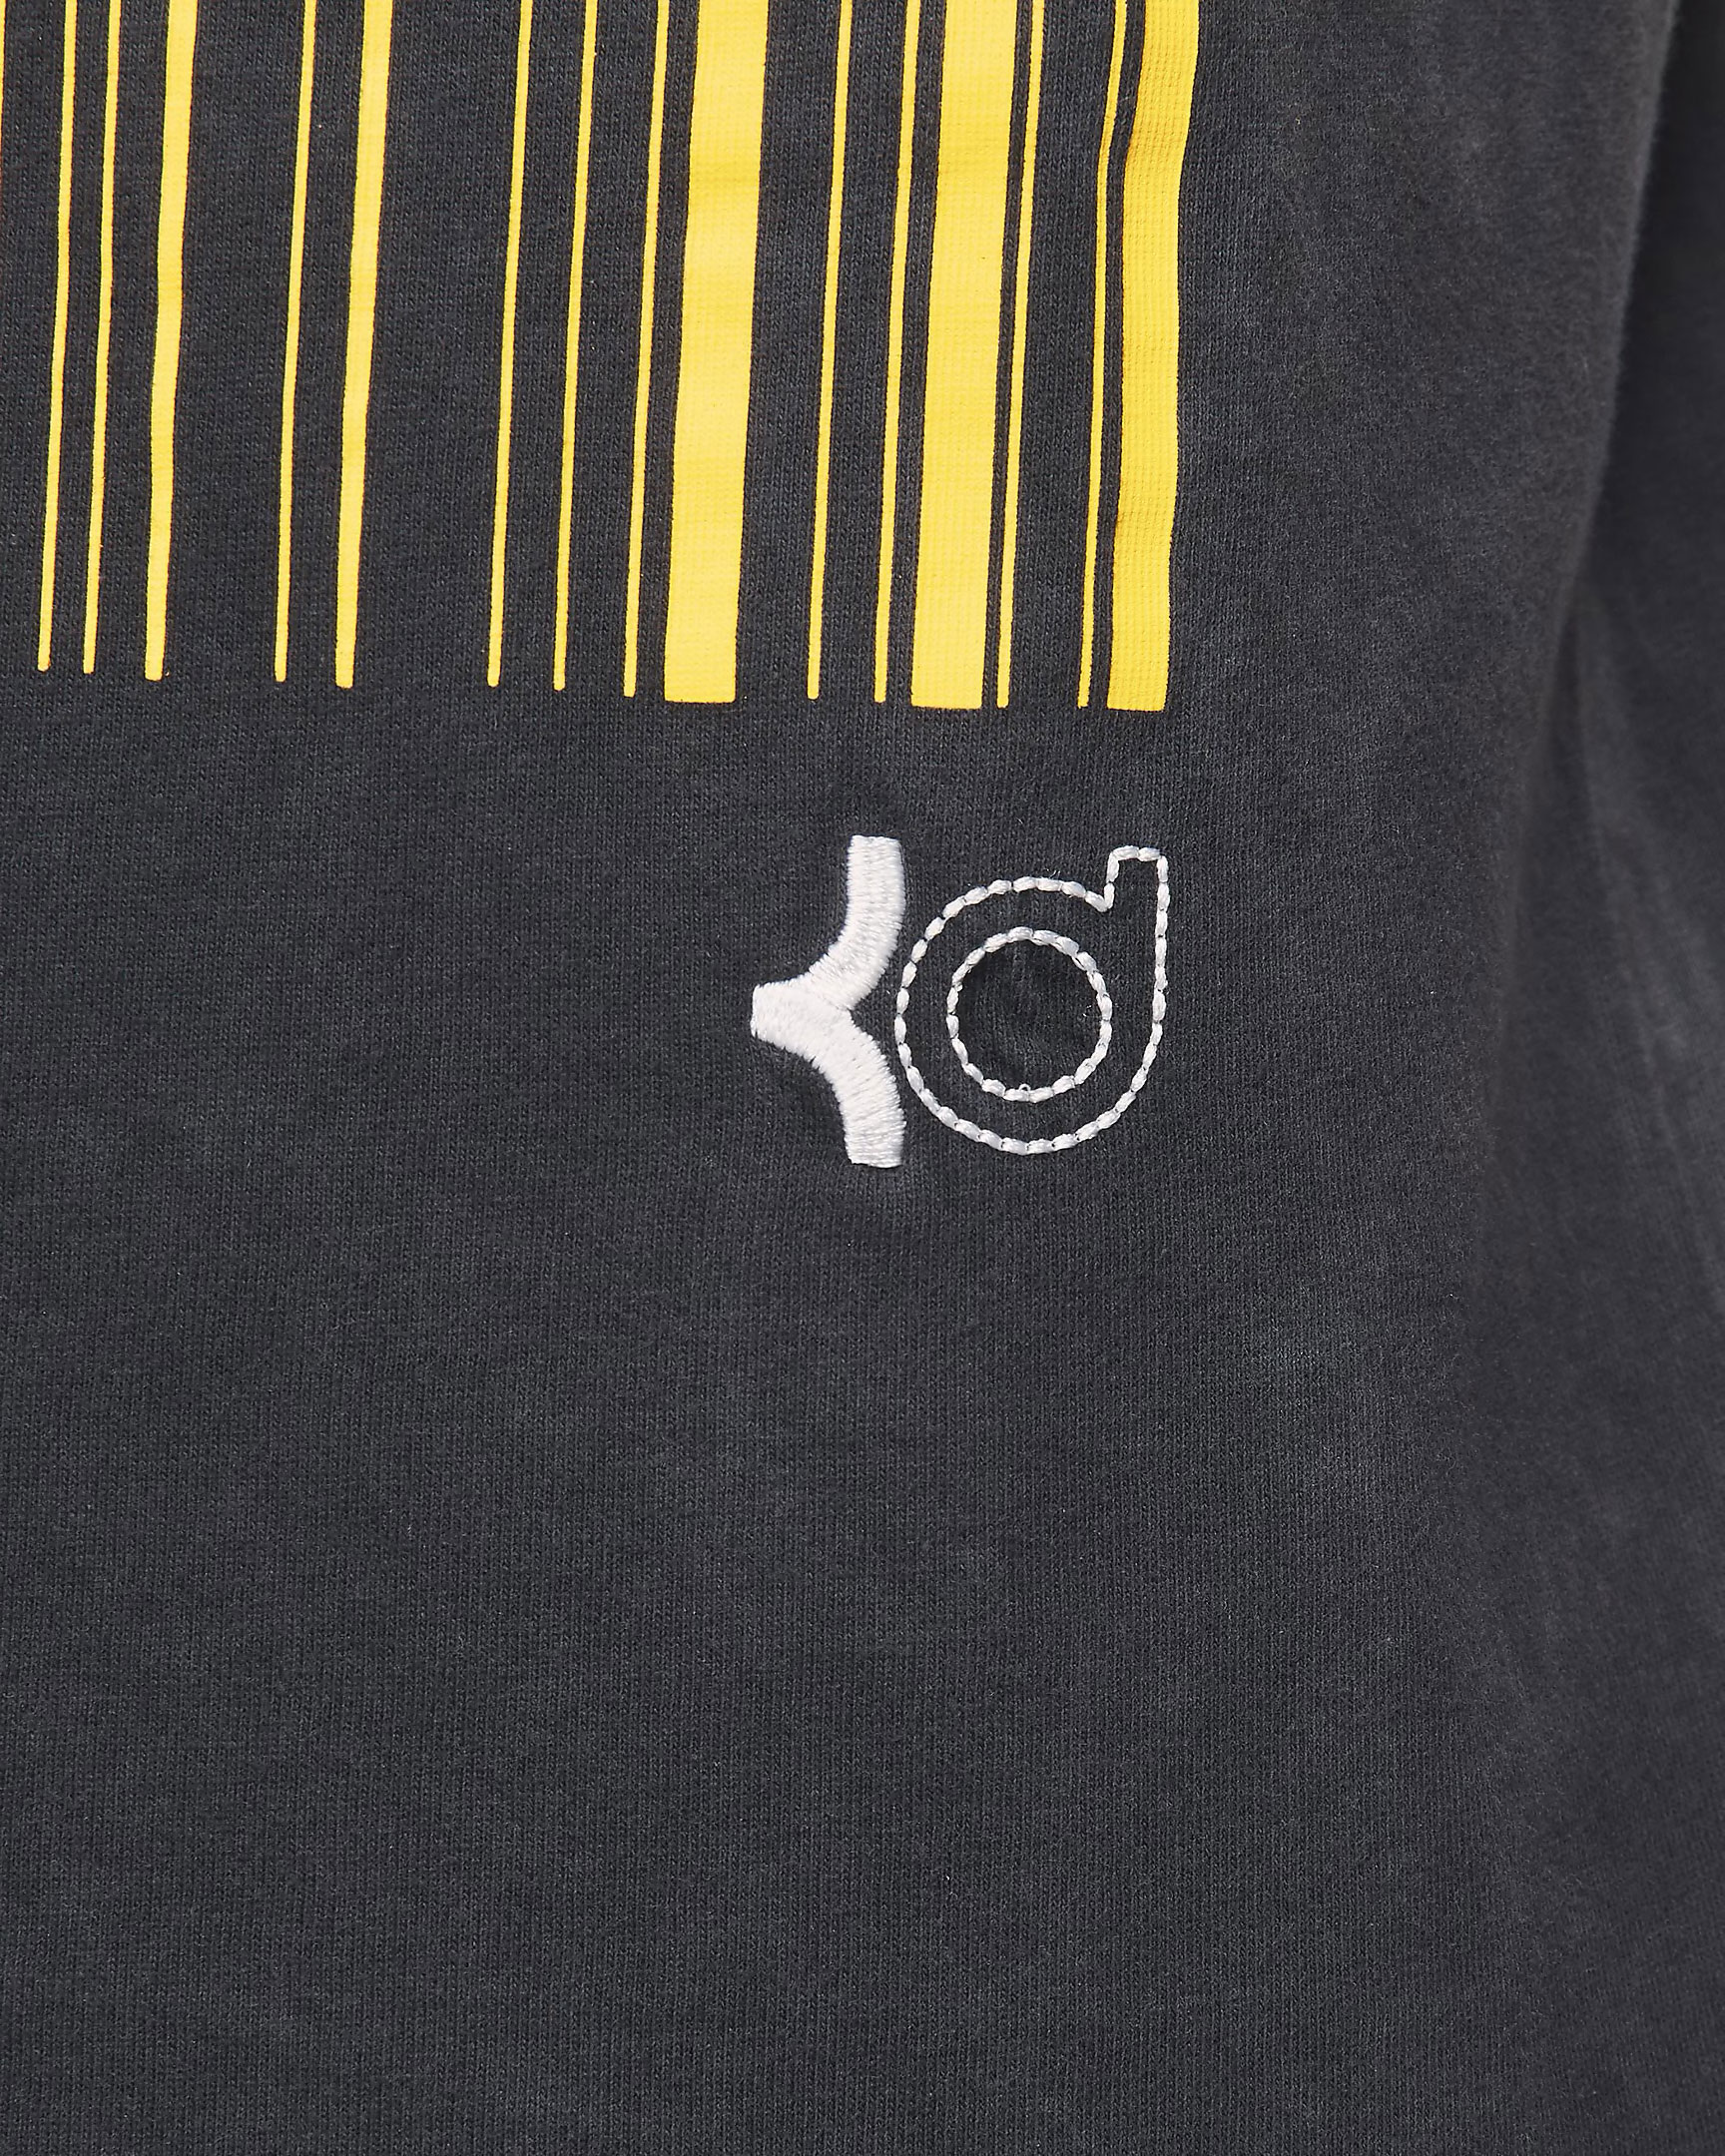 nike-kd-13-hype-shirt-5